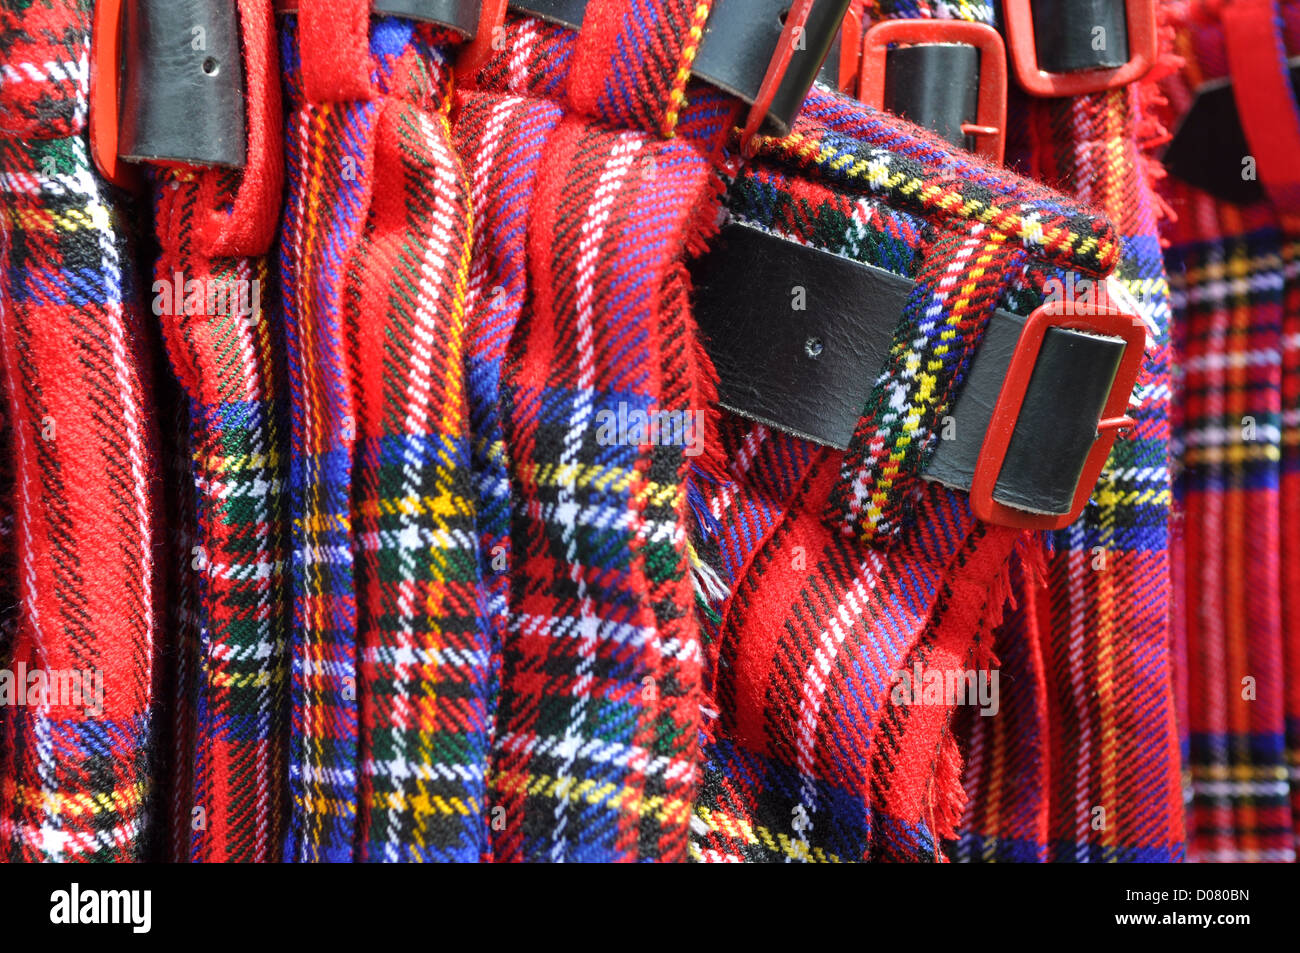 Scottish Kilts Stock Photos & Scottish Kilts Stock Images - Alamy